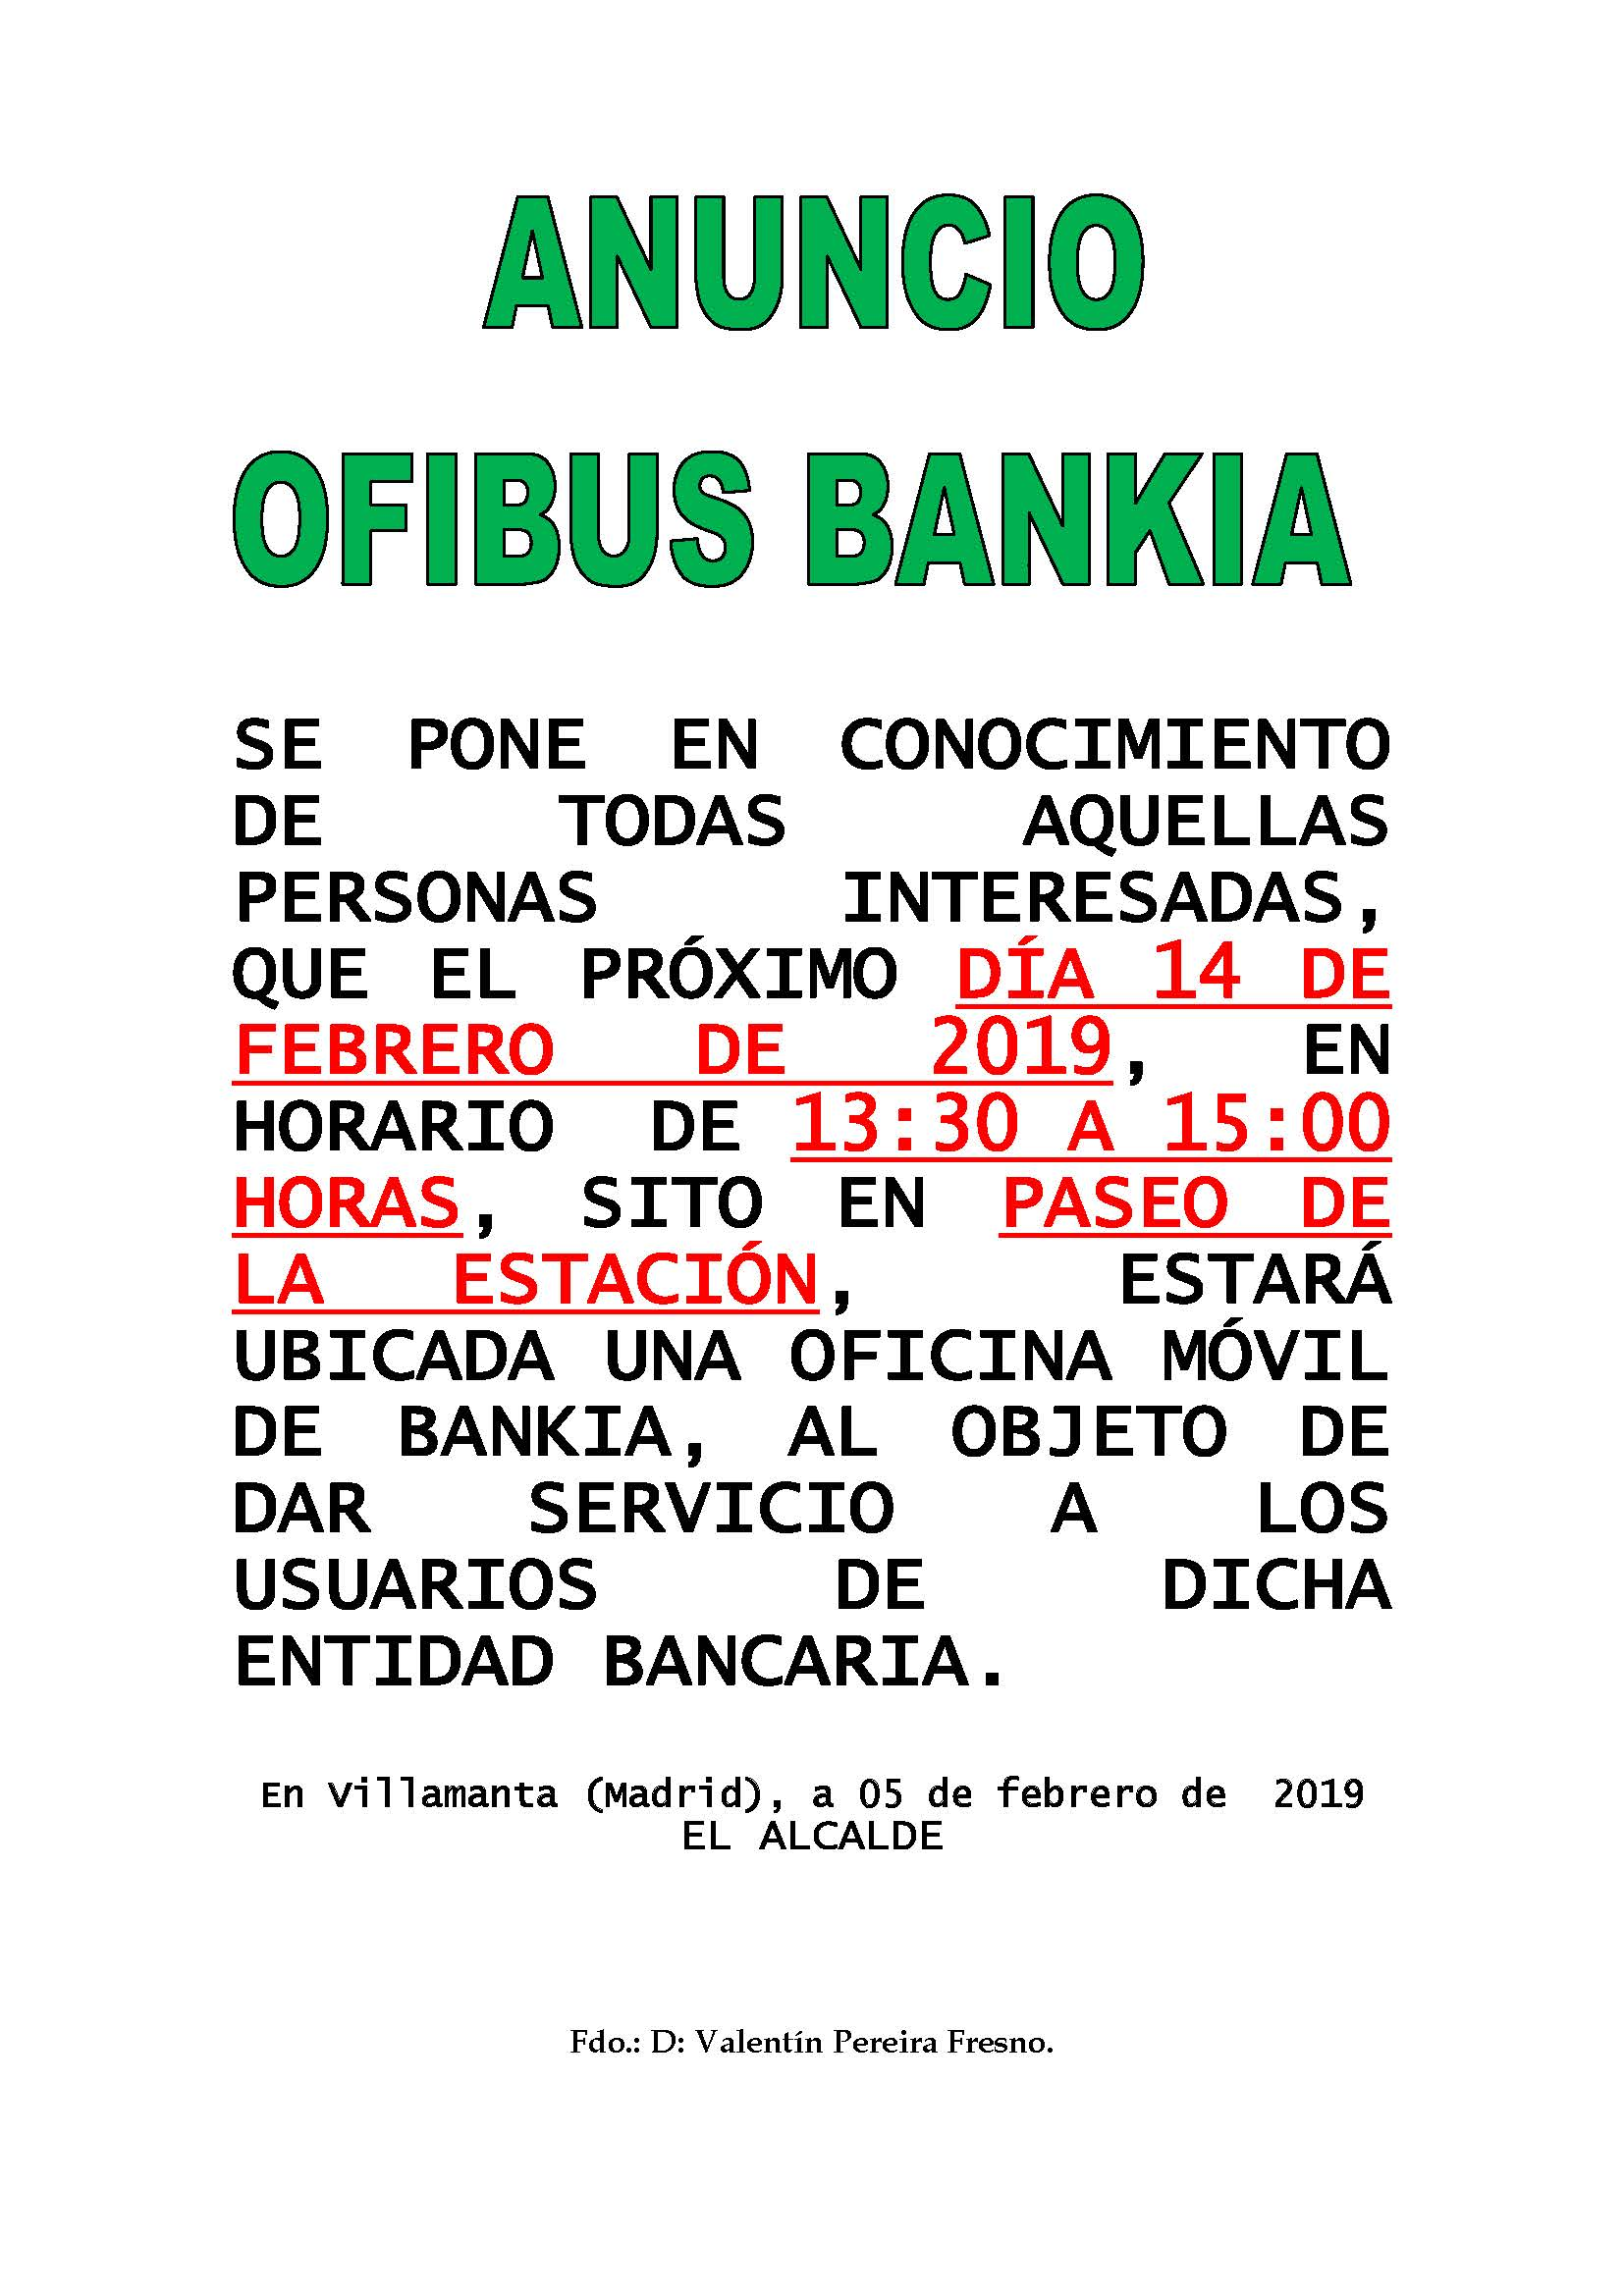 Ofibus Bankia 14 de Febrero